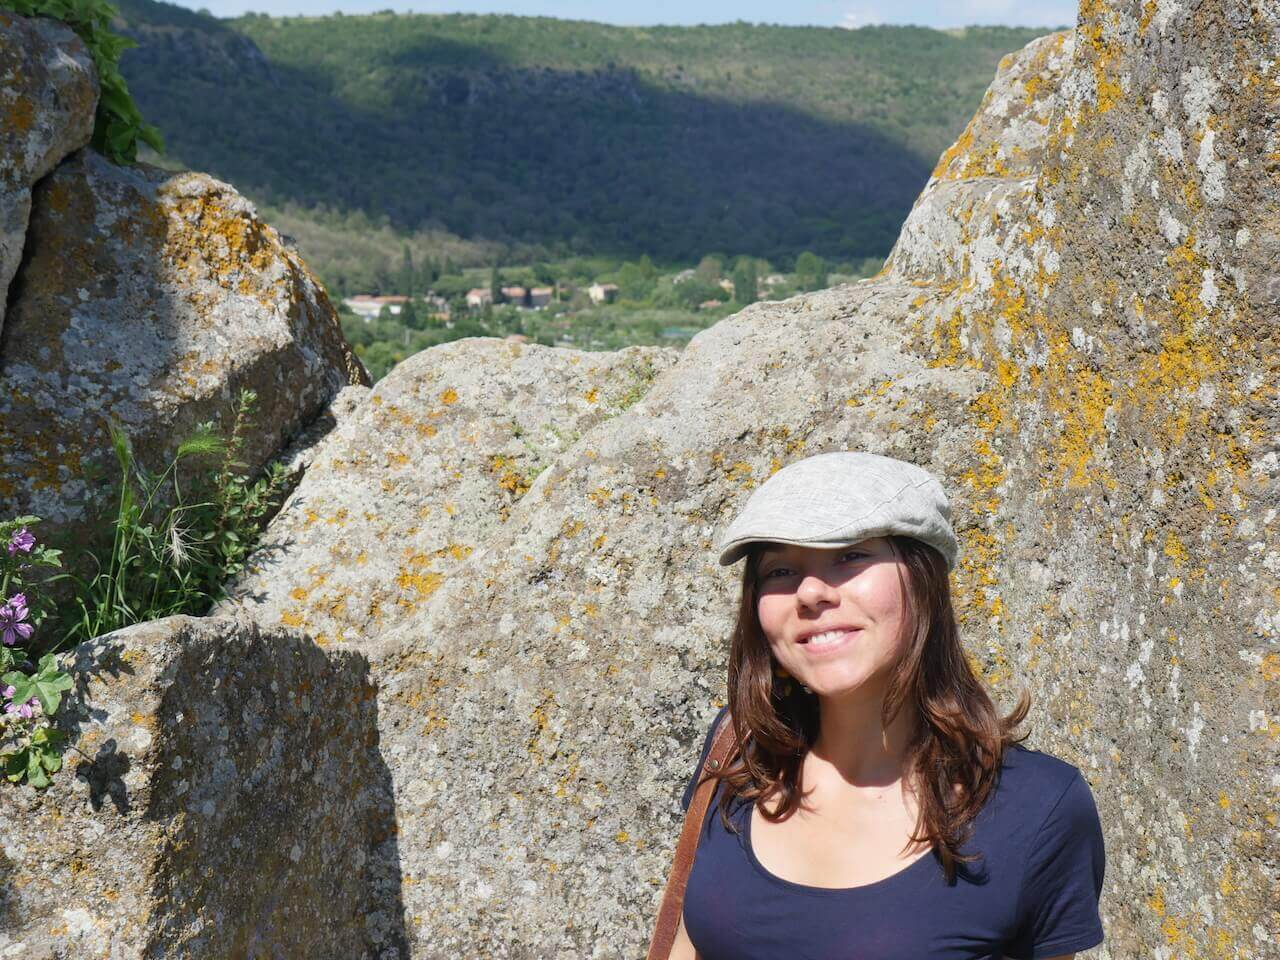 trevignano romano day trip from rome